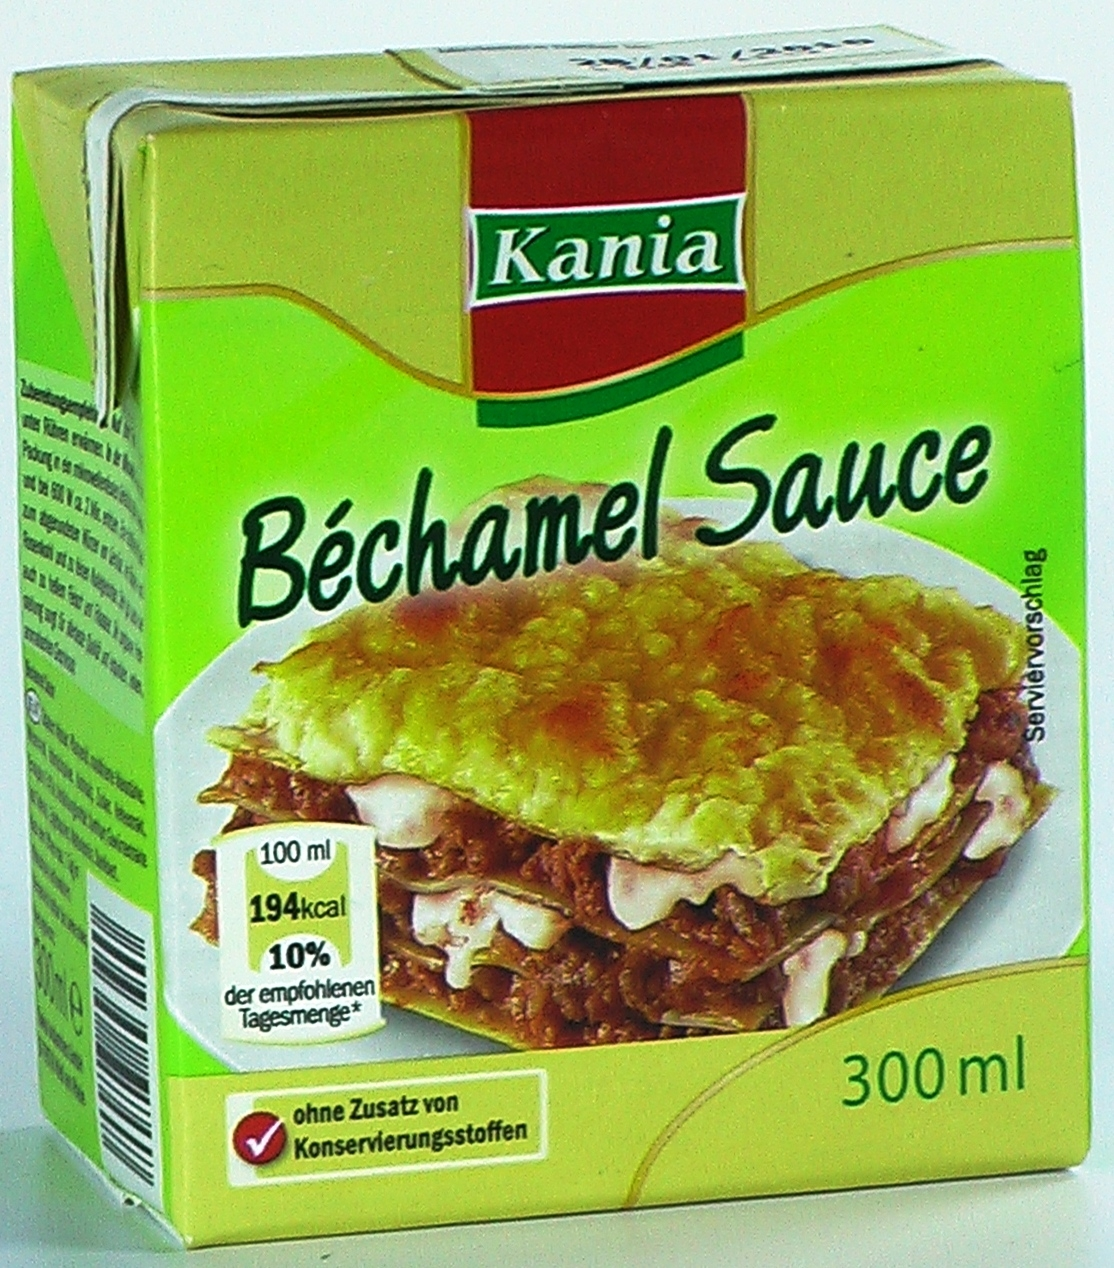 Feinkost Bechamel Sauce 300 Milliliters M Industrie Deutschland Gmbh Sauces Cooking Perishable Food Beverage Tobacco Seasonings Preservatives Extracts Sauces Spreads Dips Condiments Mynetfair